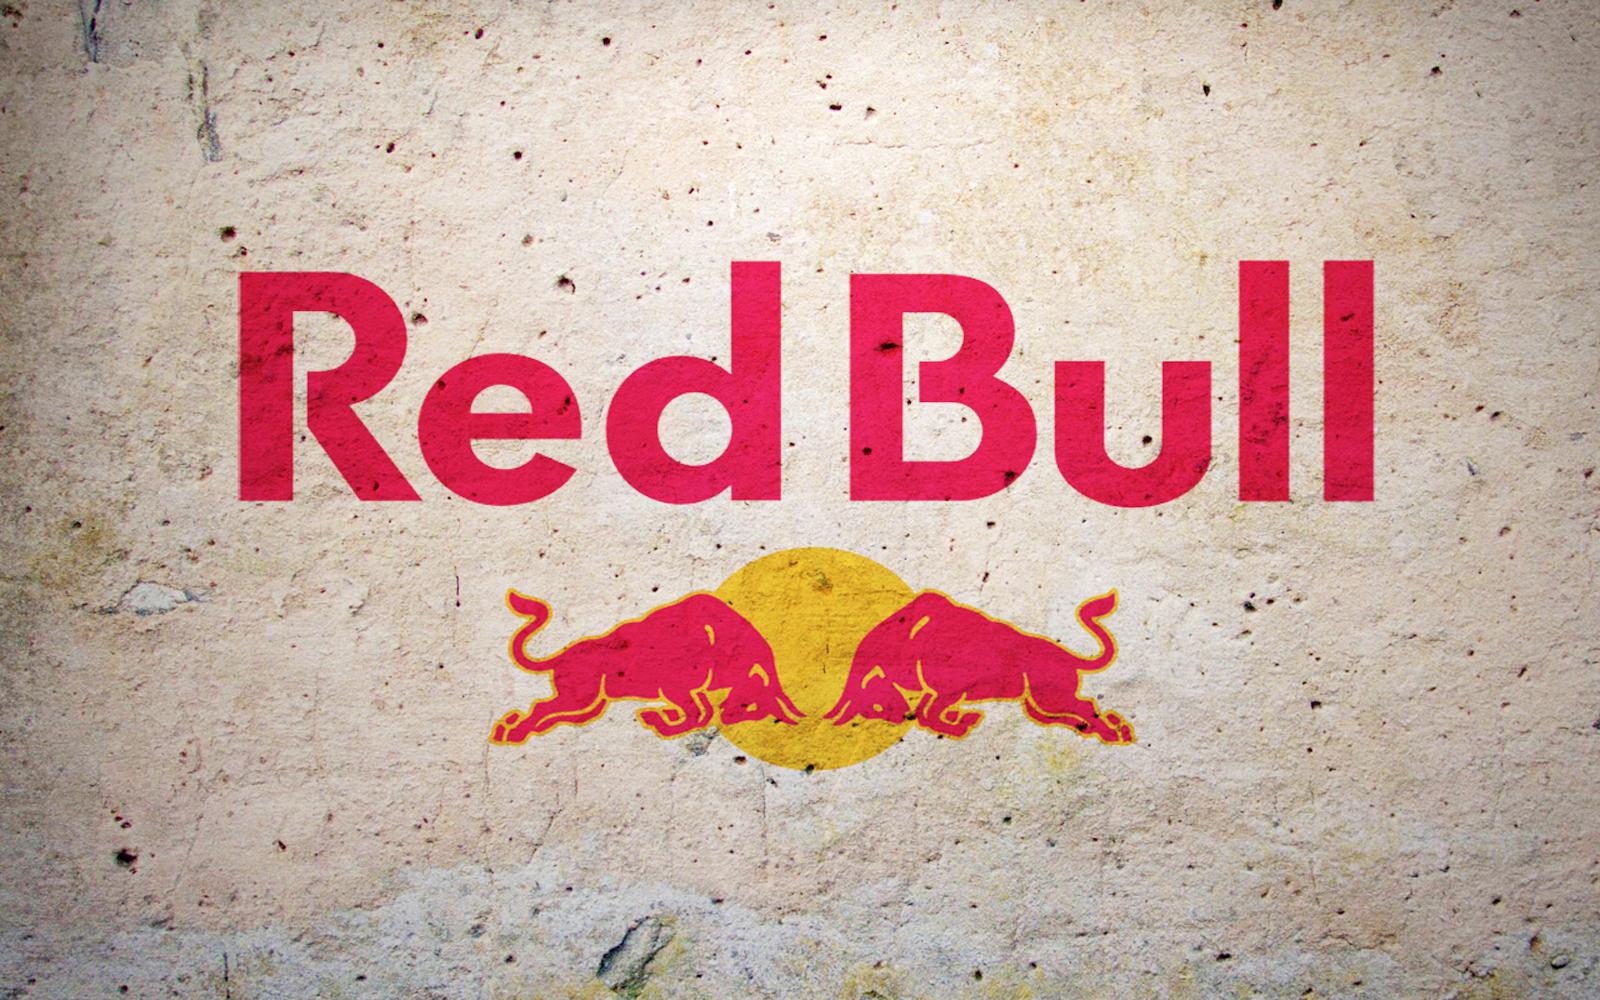 http://3.bp.blogspot.com/-_dCc4glZNtM/UPYoknDT-GI/AAAAAAAAIXw/4ZCYE5OB-dg/s1600/Red-Bull-Logo-centre12.jpg